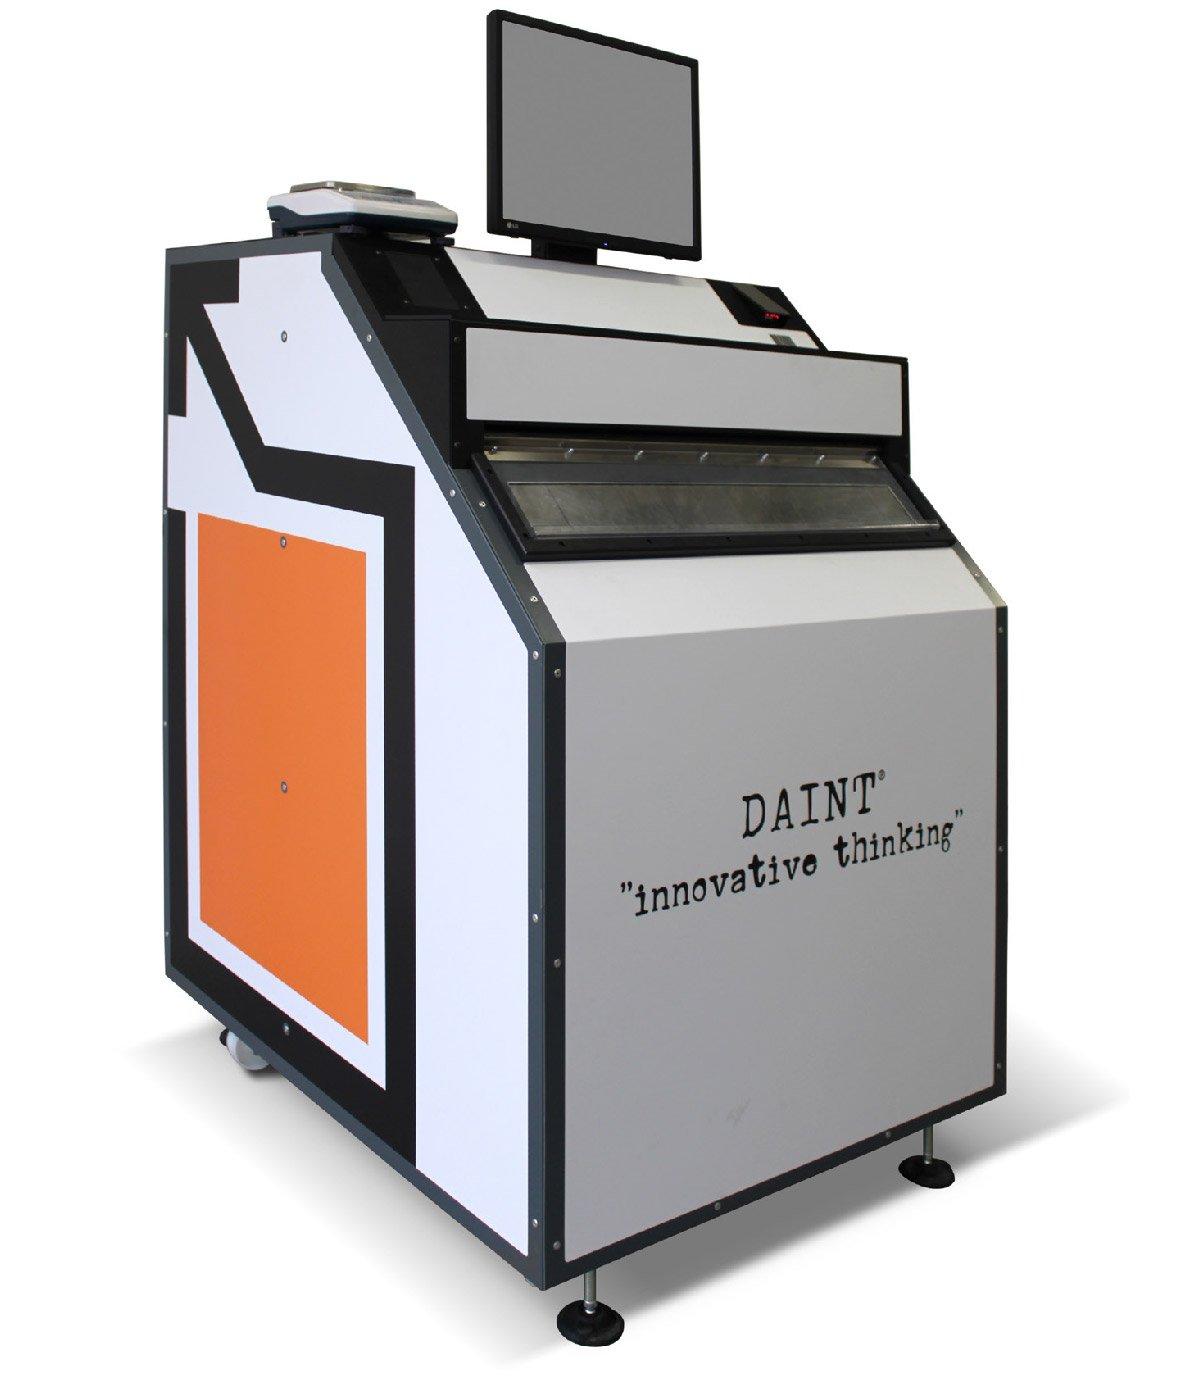 TOOLMAT24 - Daint srl Distributori Automatici